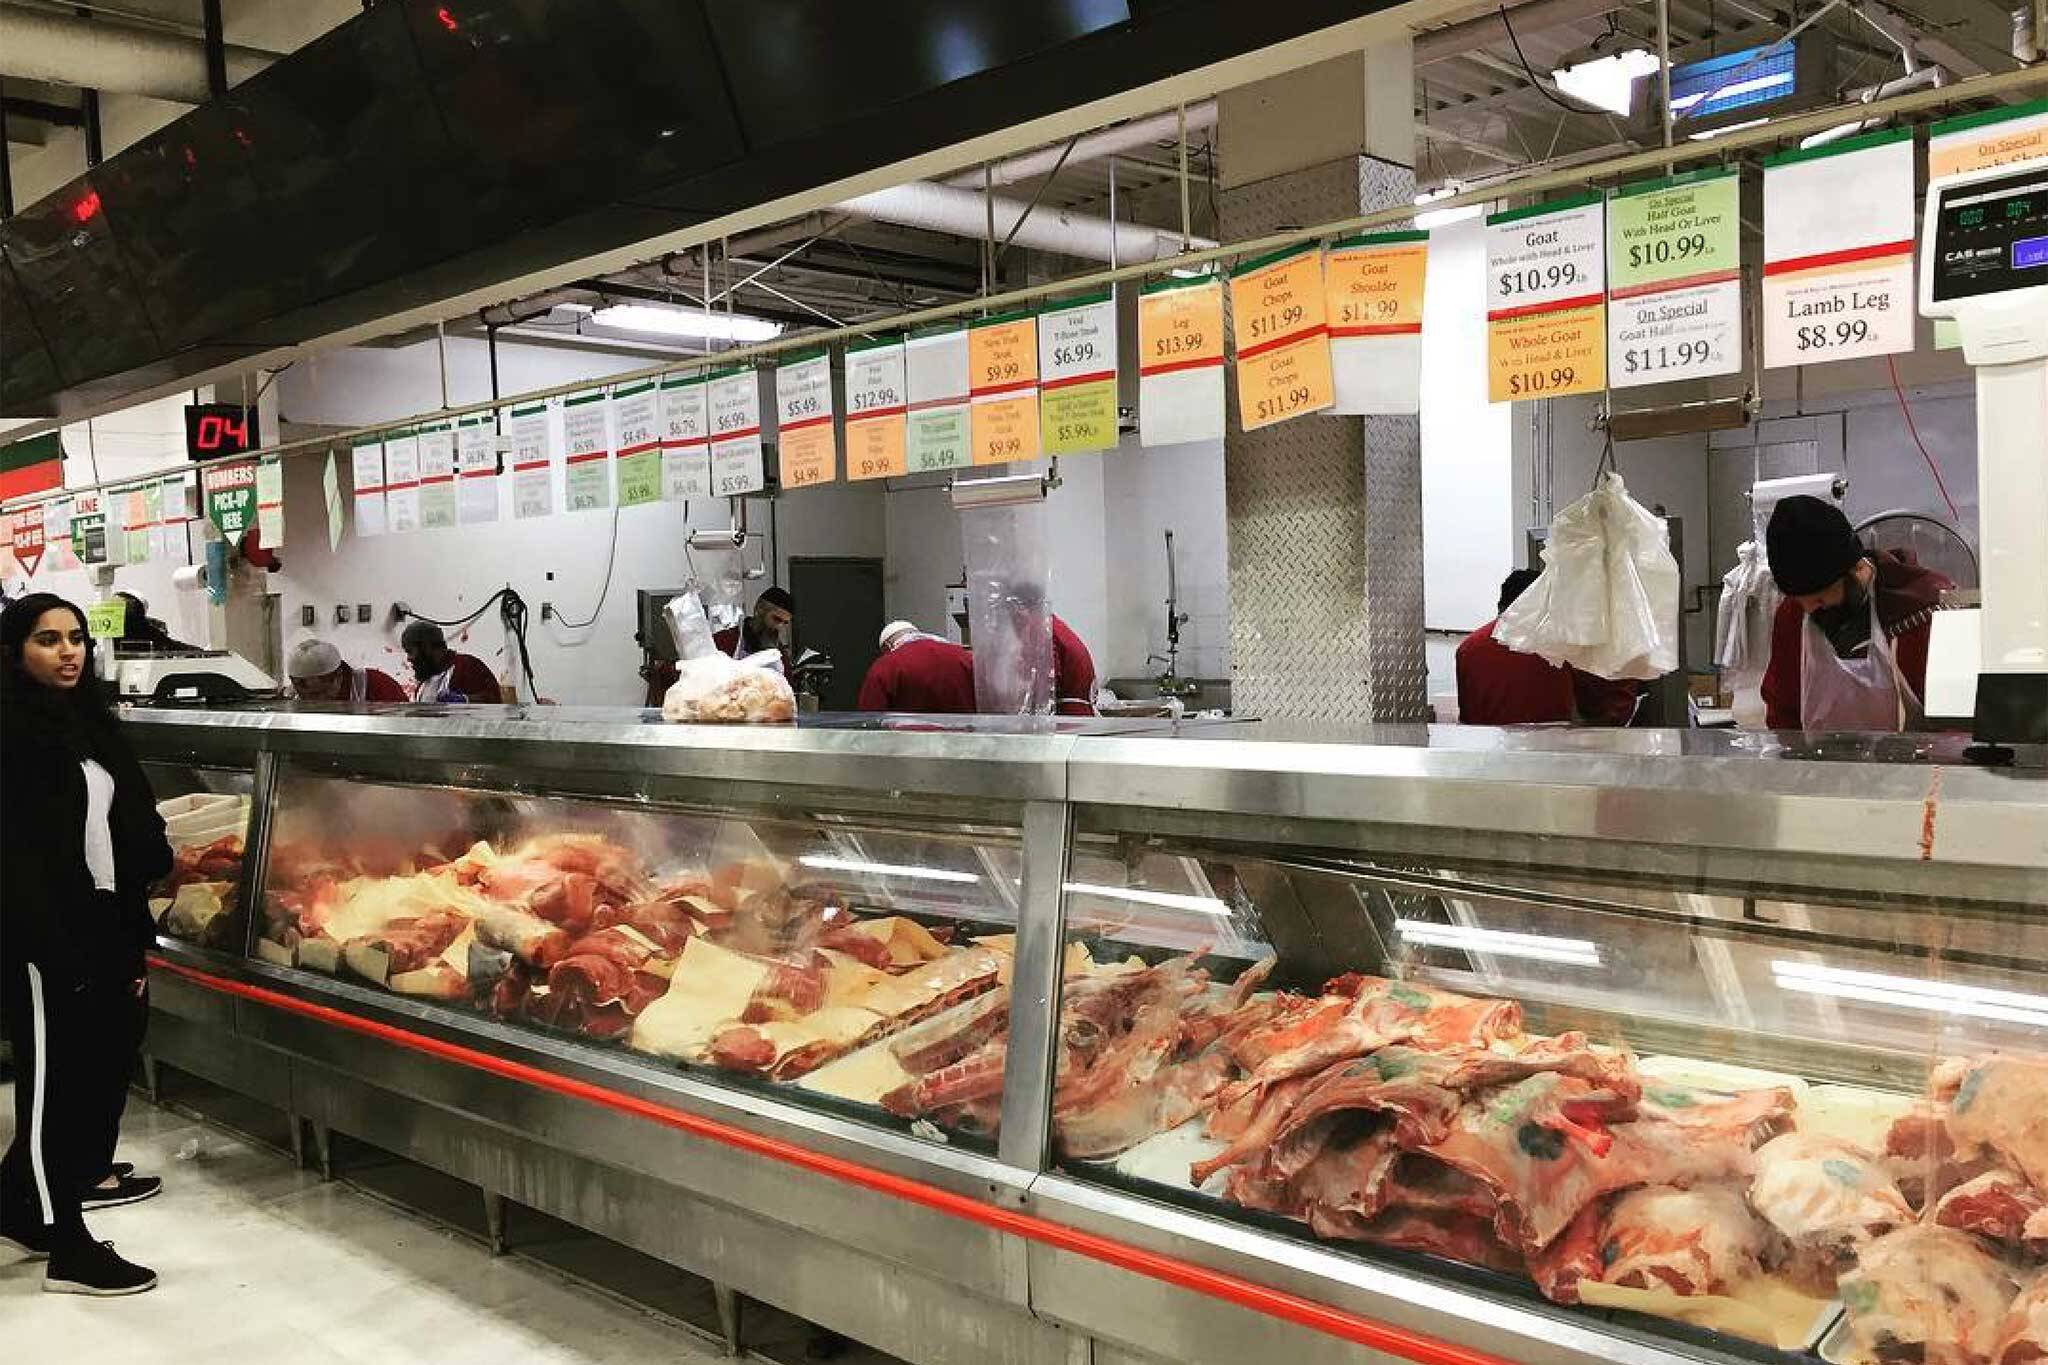 Toronto's popular Halal supermarket expanding with huge new